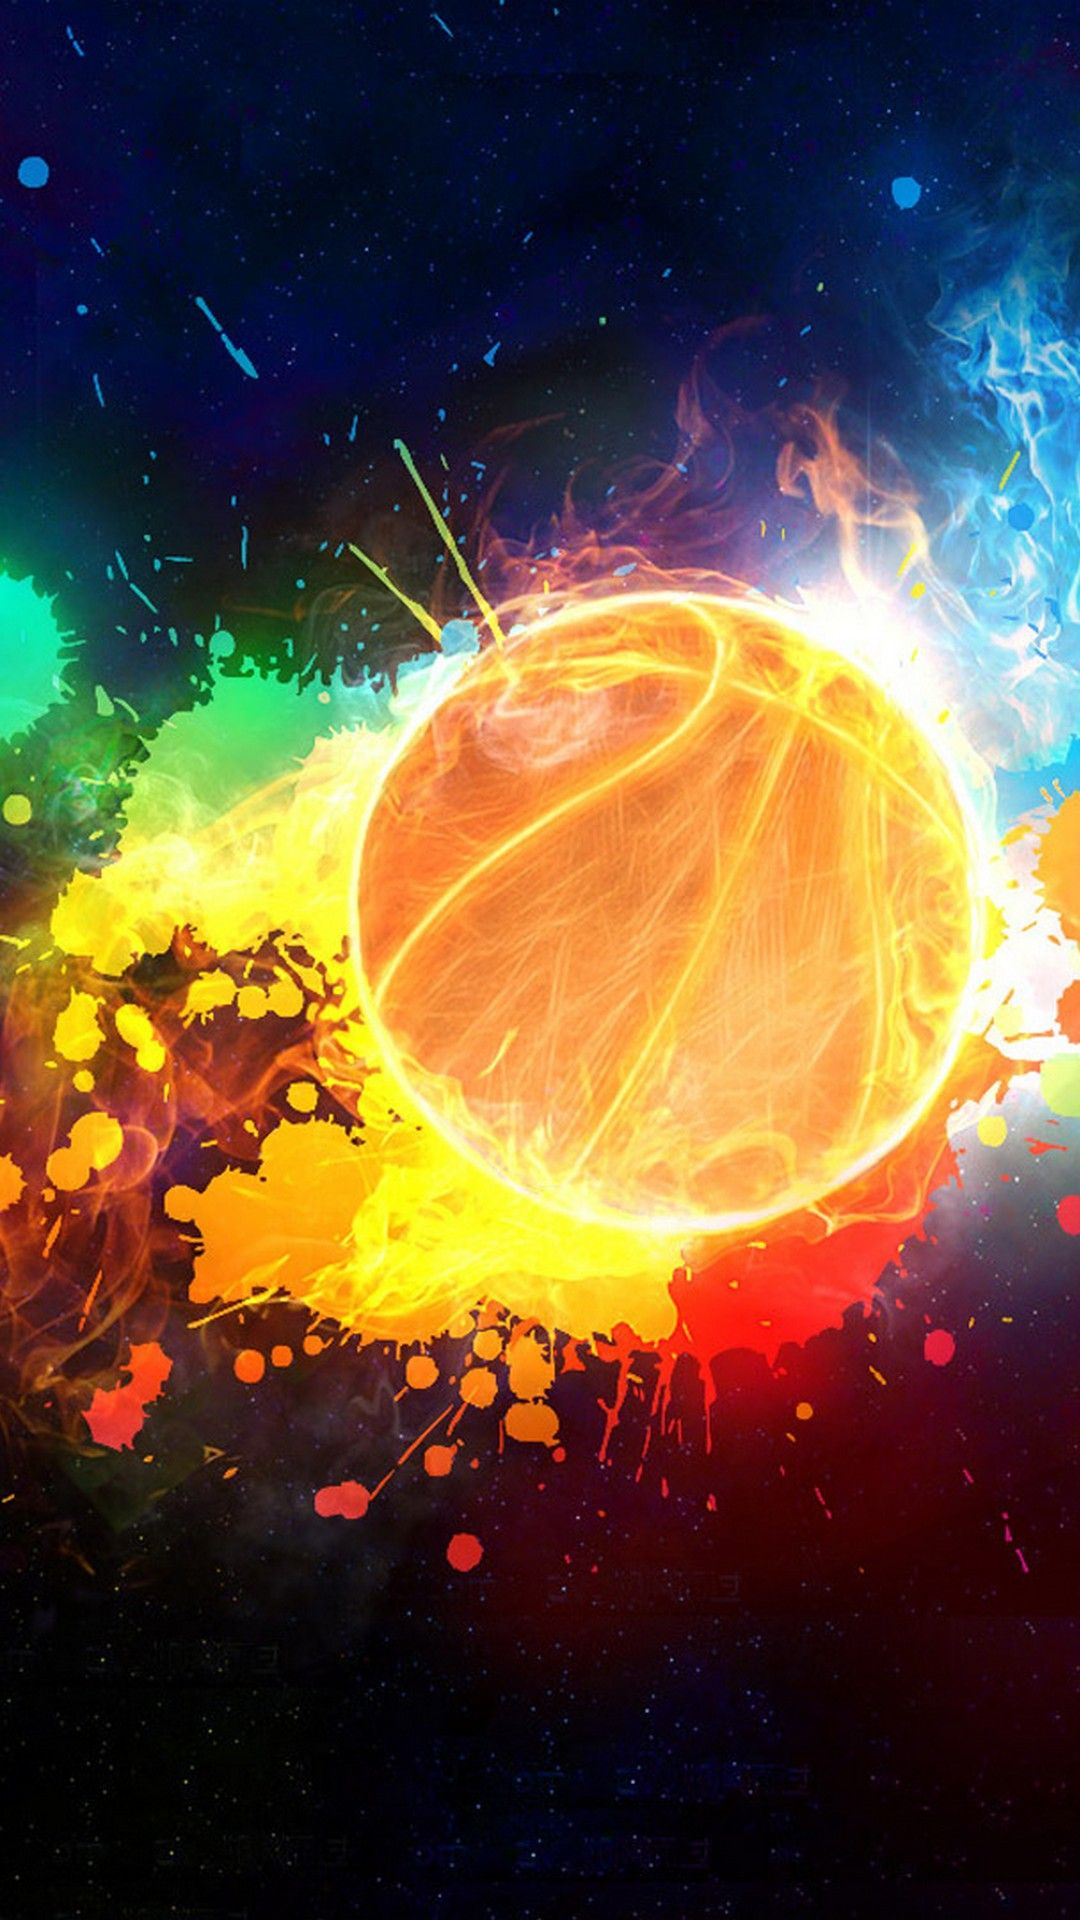 Basketball Games Iphone 6 Wallpaper Cool Basketball Wallpapers